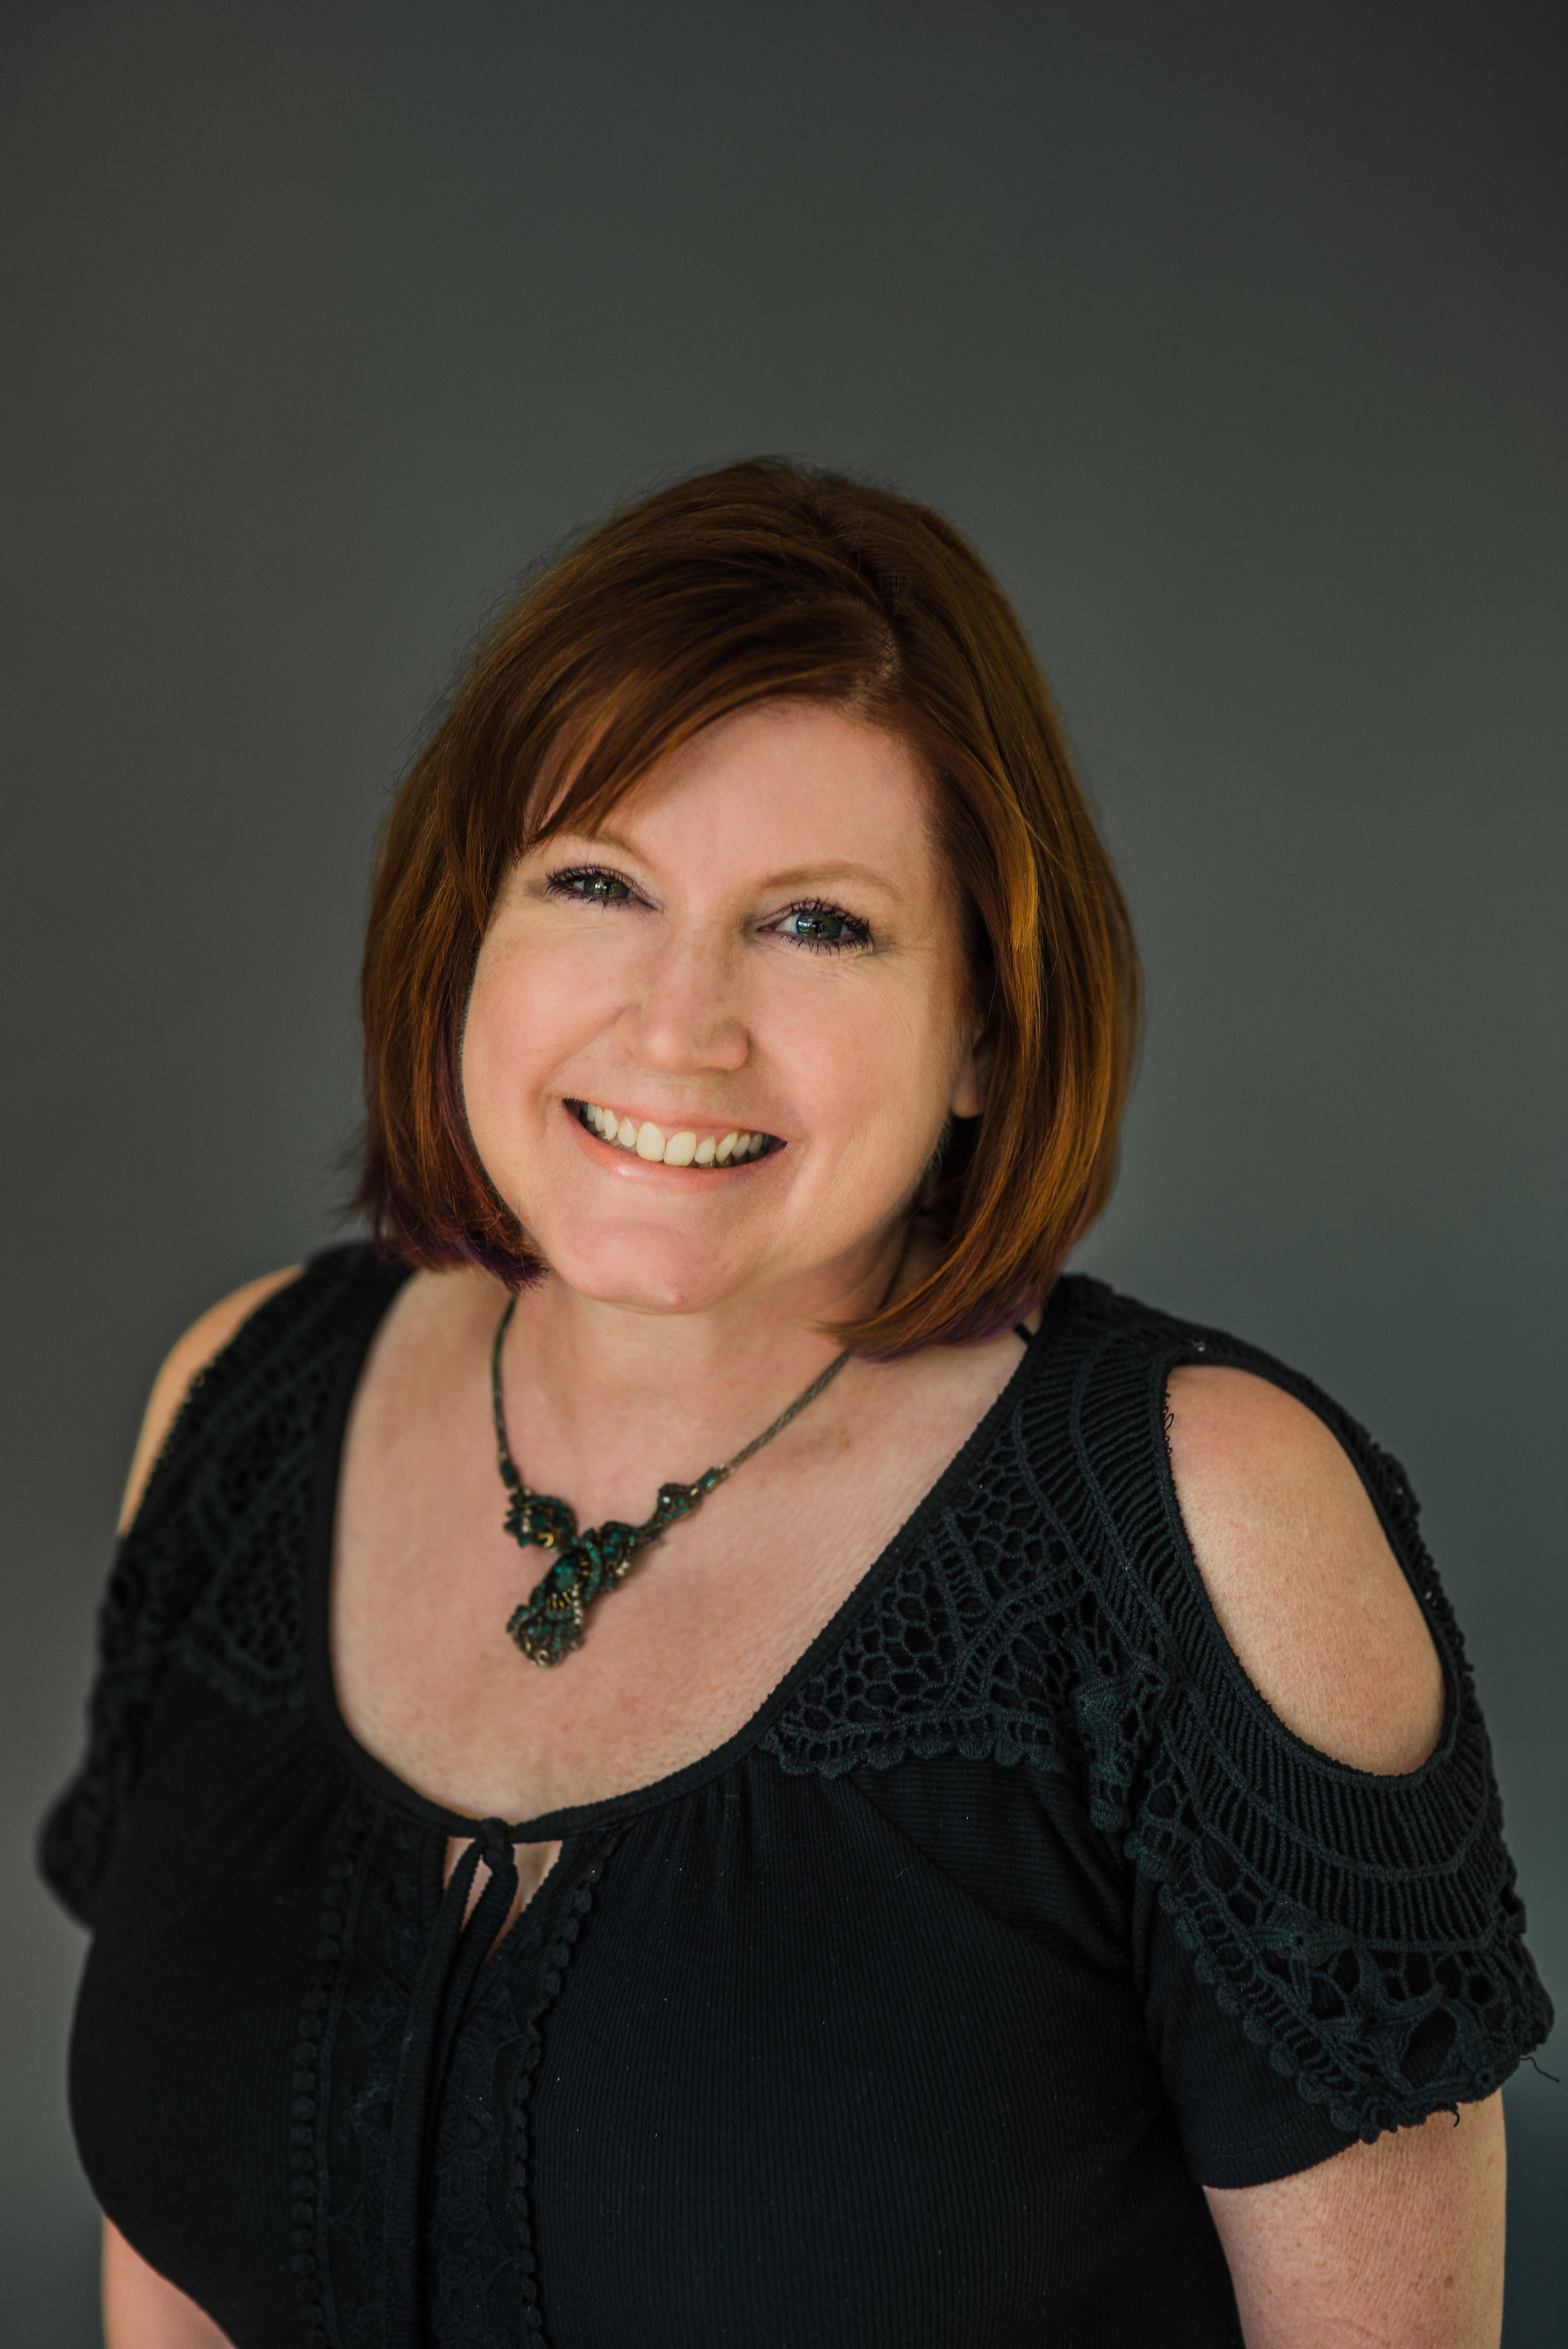 SHEILA BARKLEY Master Stylist     Learn More